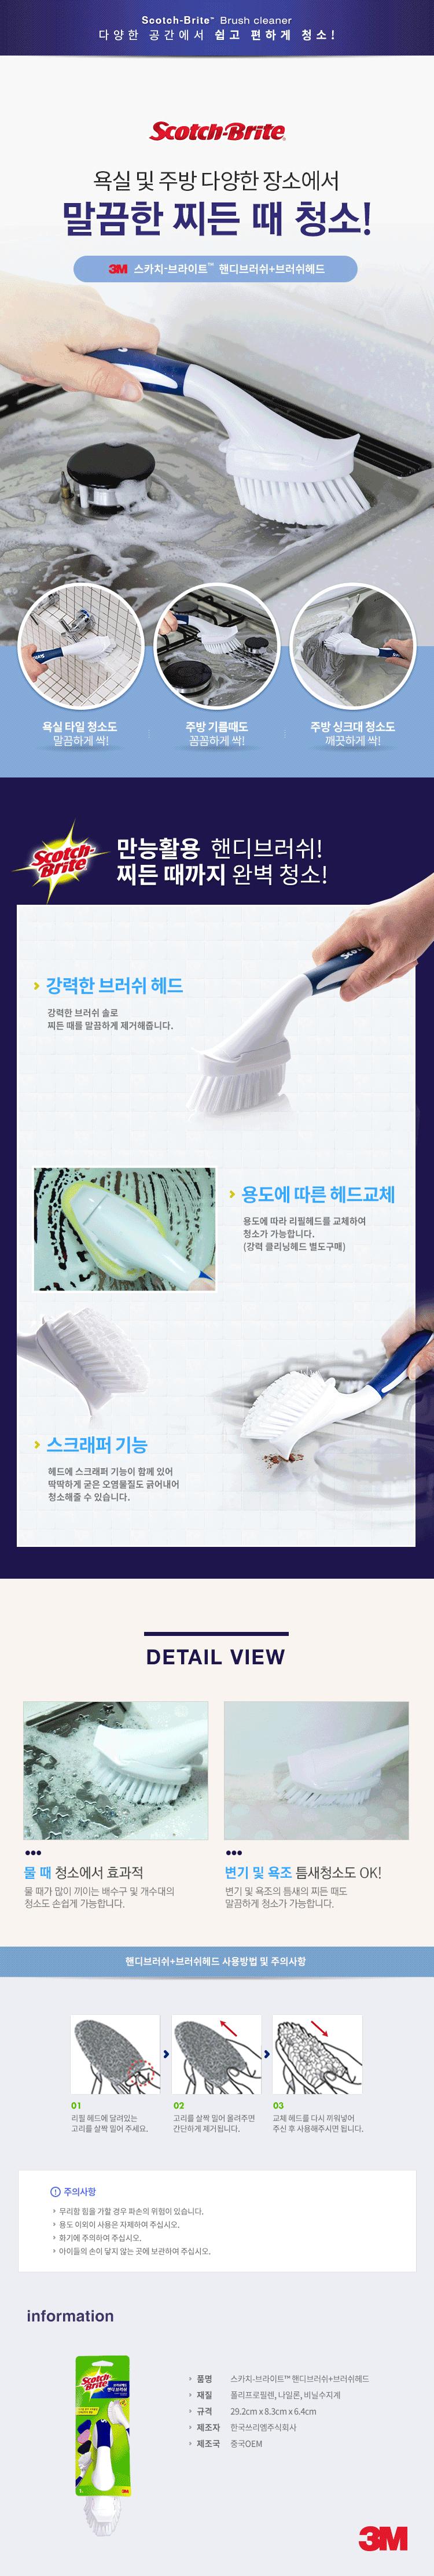 handybrush.png